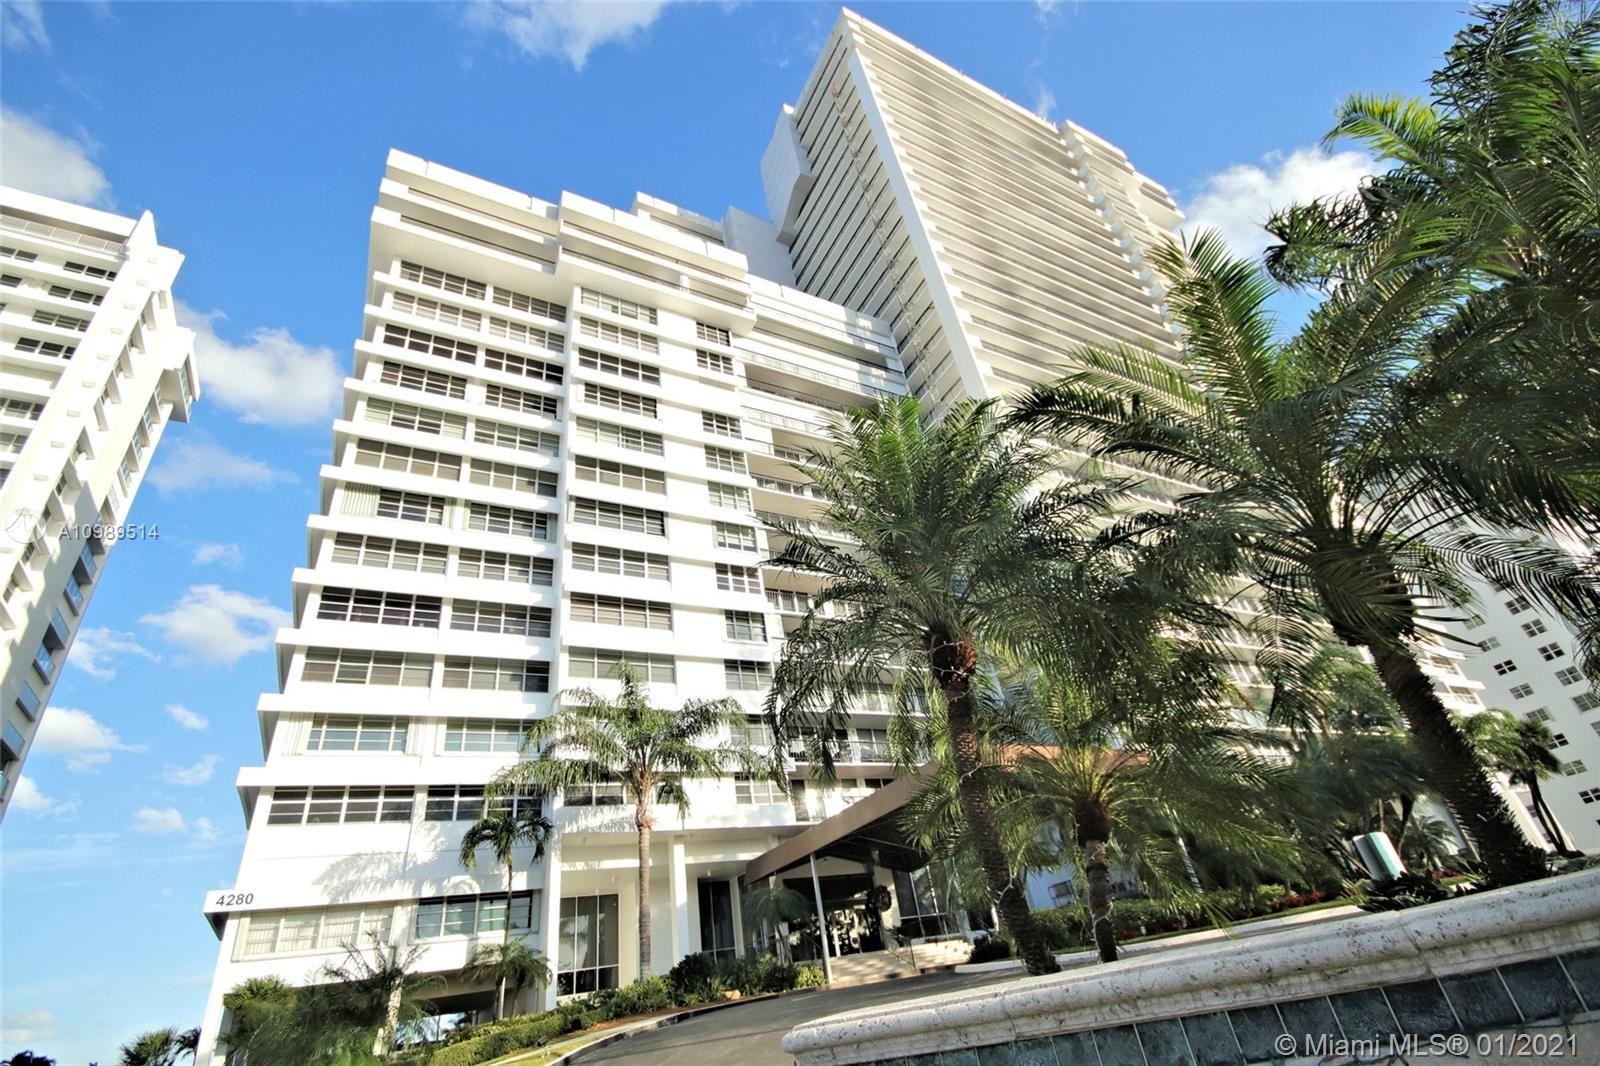 Photo of 4280 Galt Ocean Dr #8A, Fort Lauderdale, FL 33308 (MLS # A10989514)